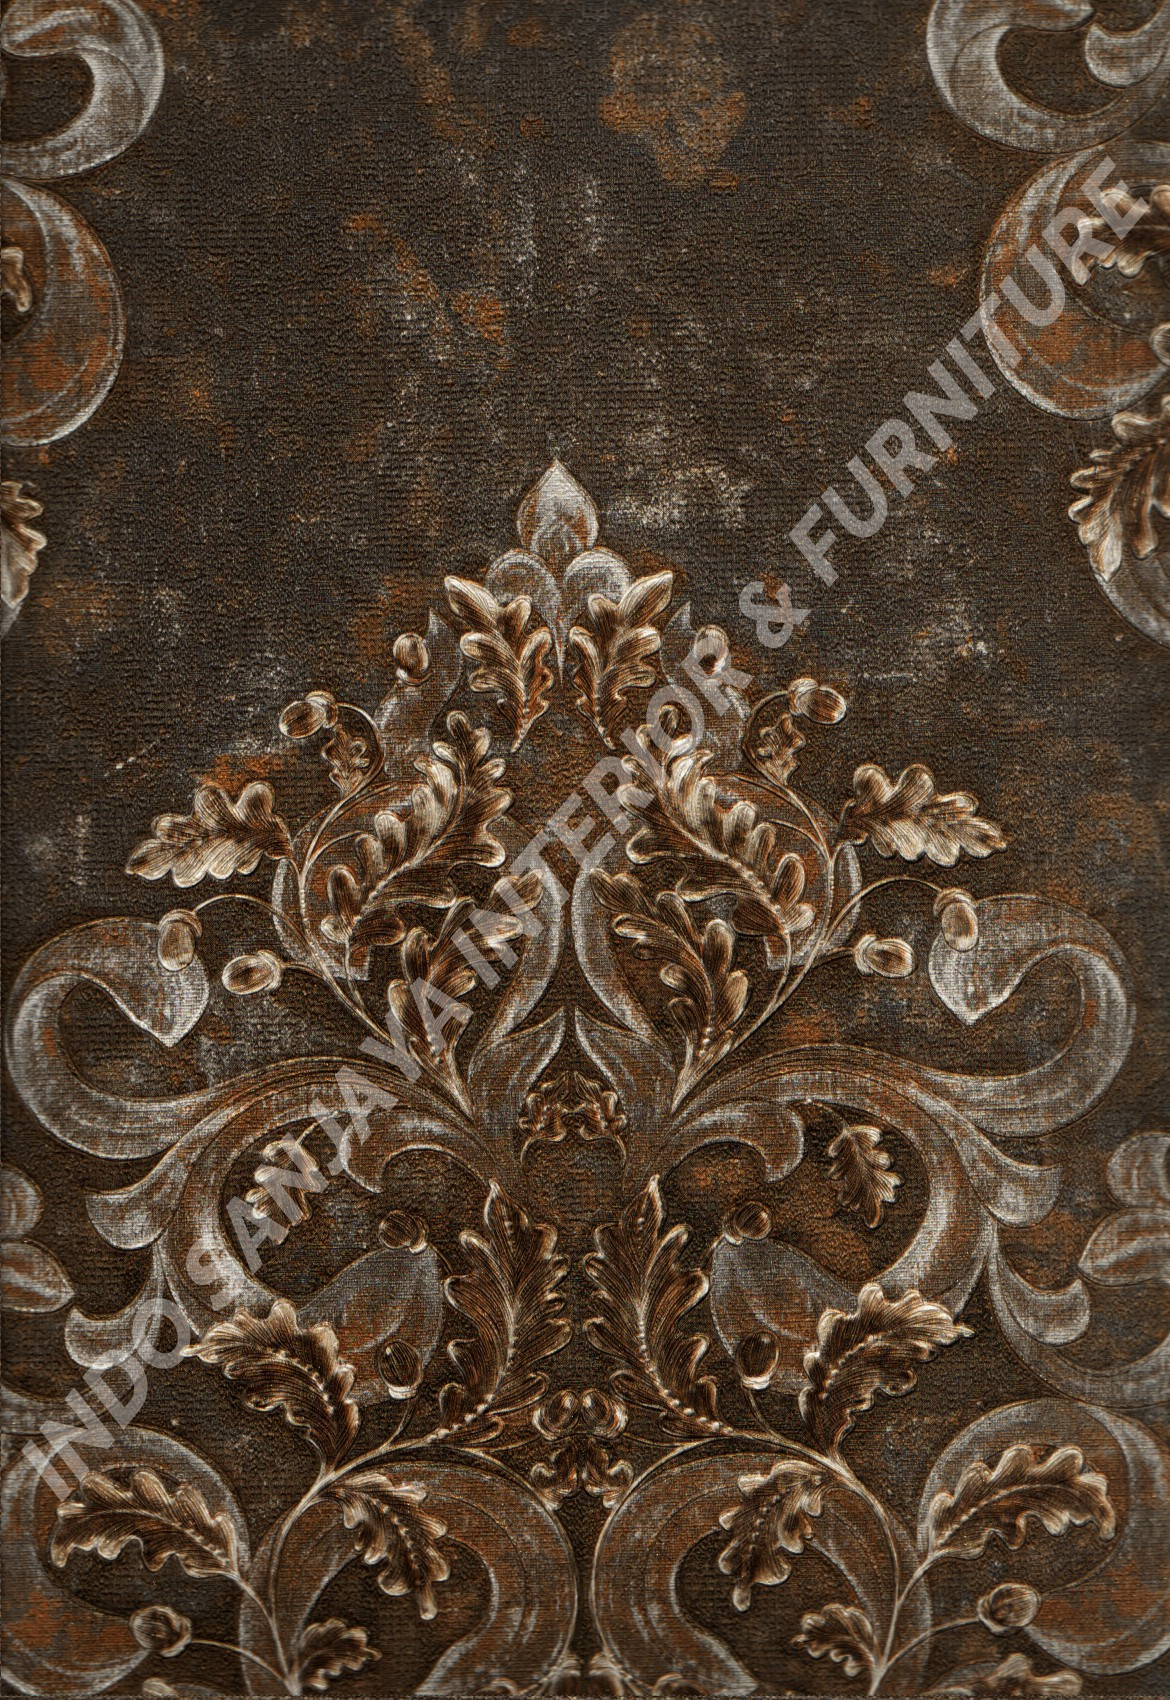 wallpaper   Wallpaper Klasik Batik (Damask) DL10301:DL10301 corak  warna